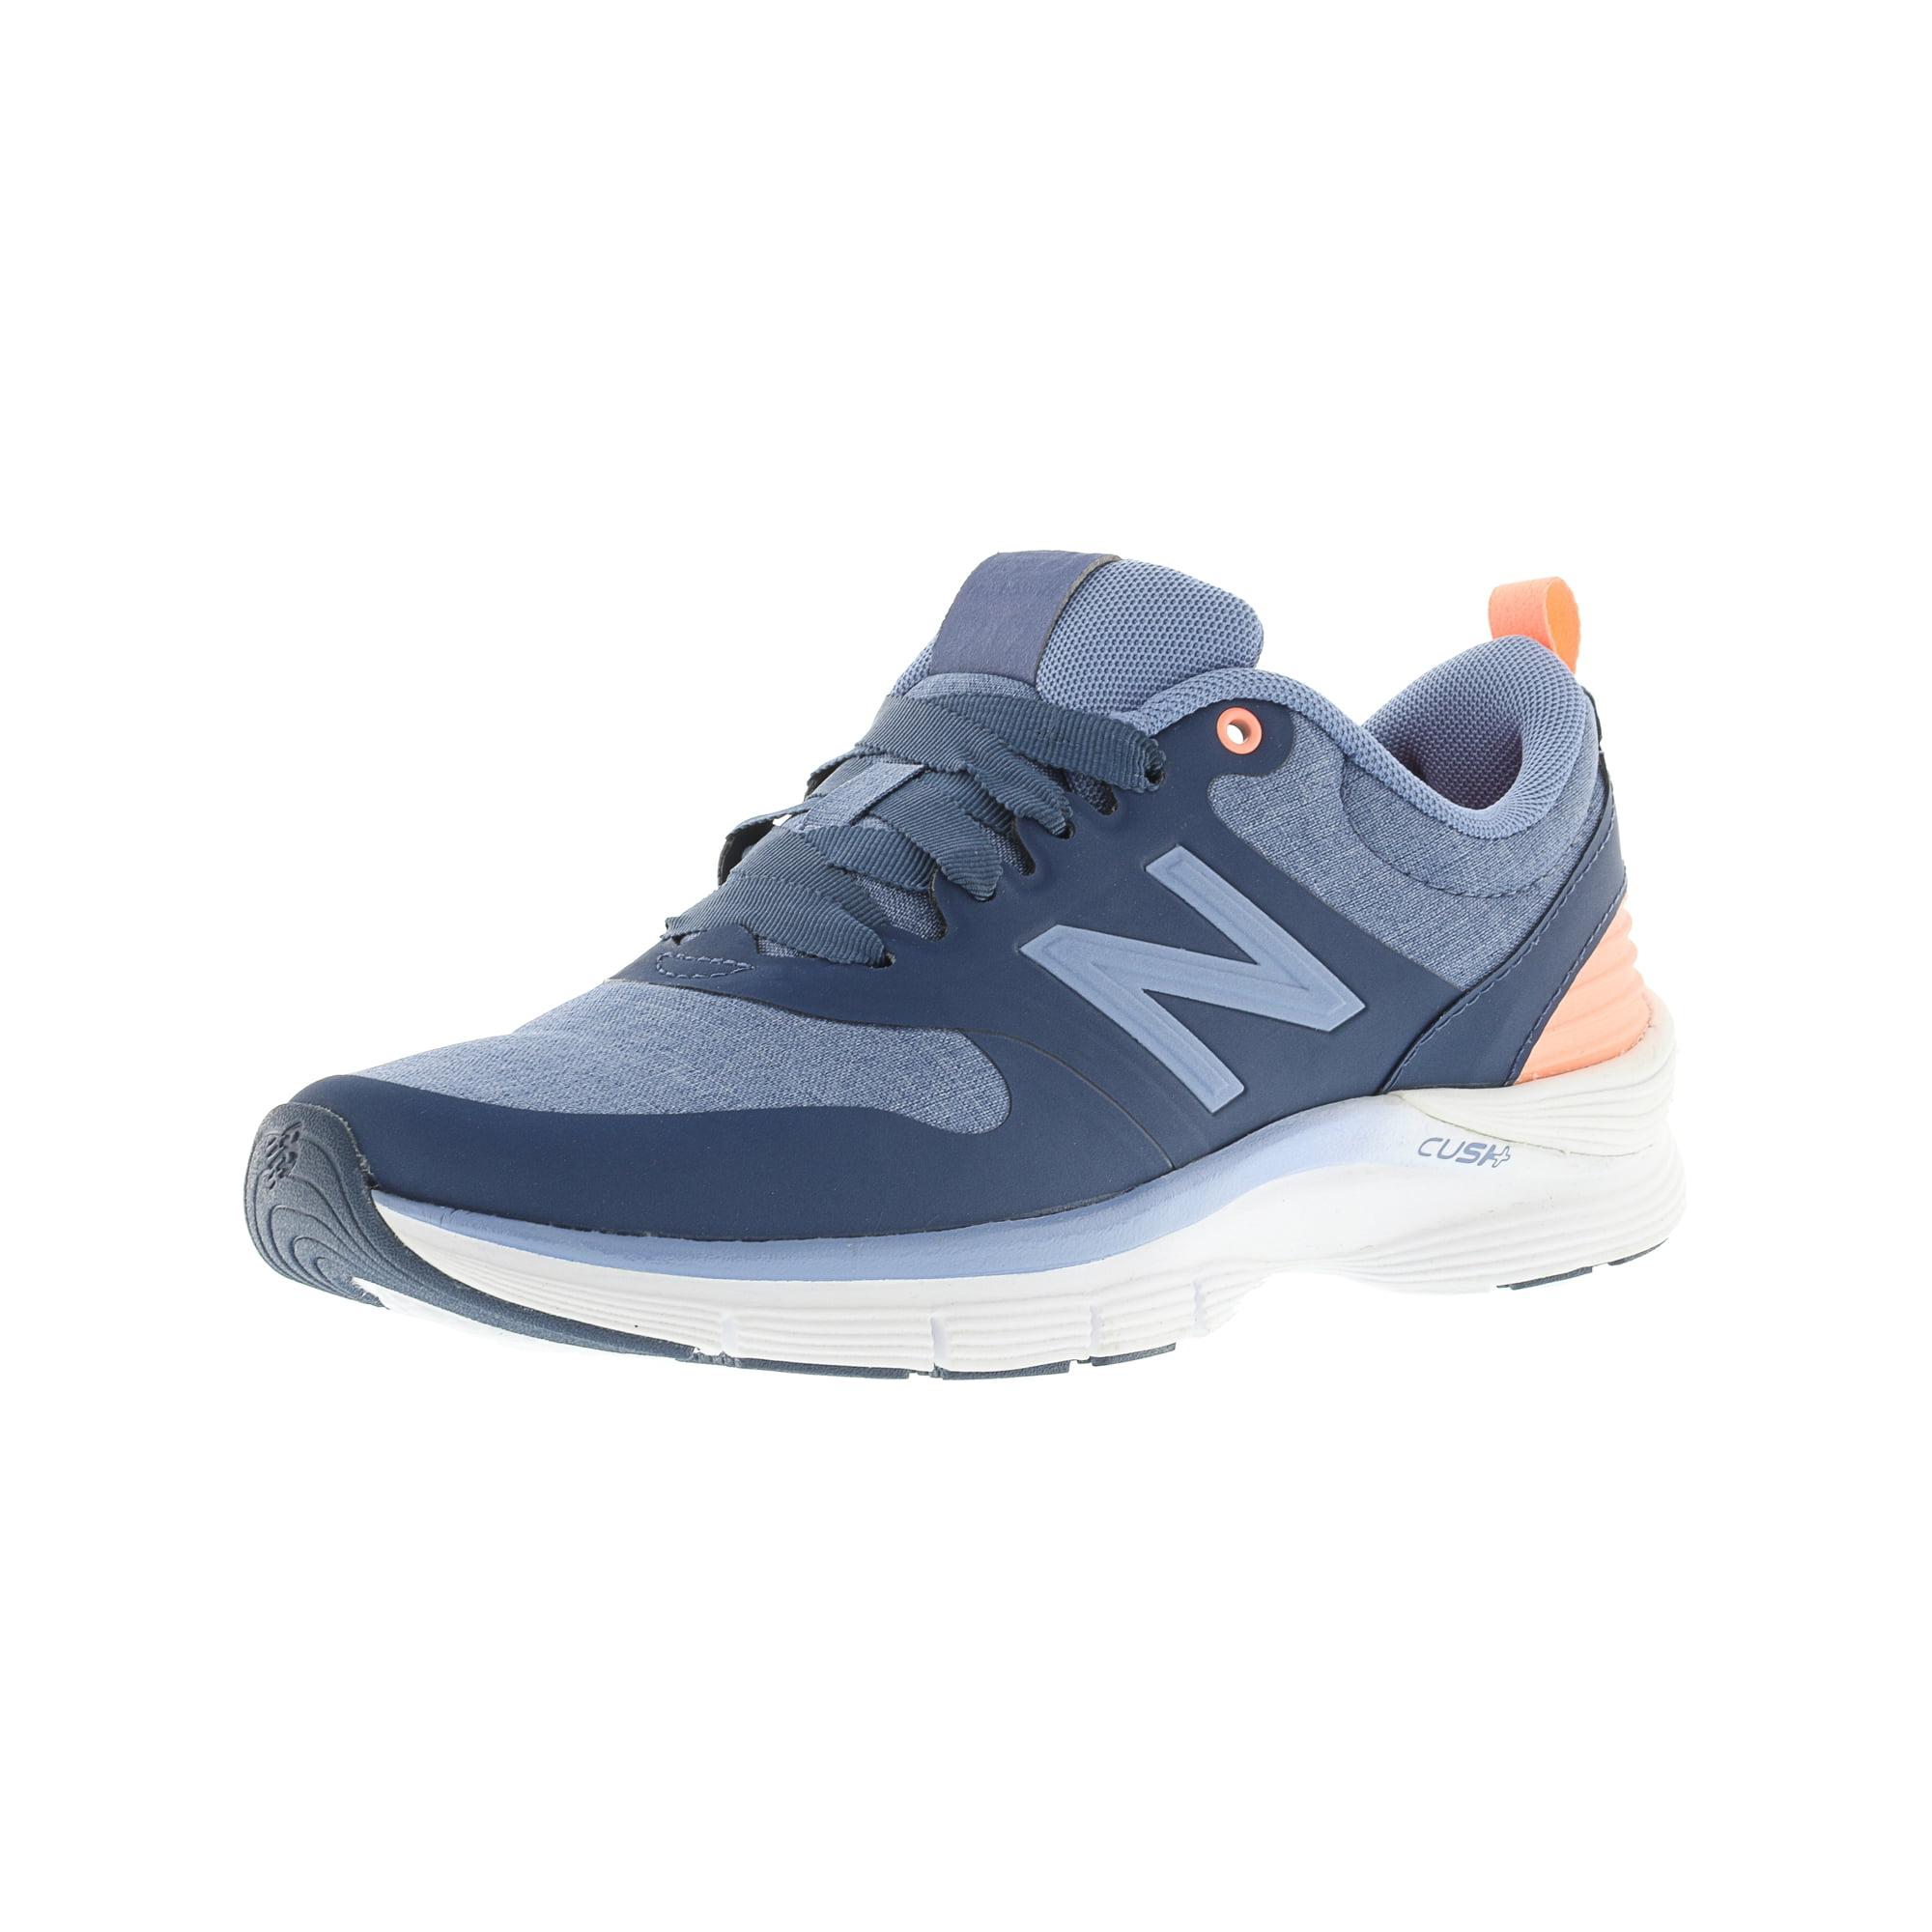 024764b03154b New Balance Women's Wf717 Sf2 Ankle-High Running Shoe - 9M | Walmart Canada  ?